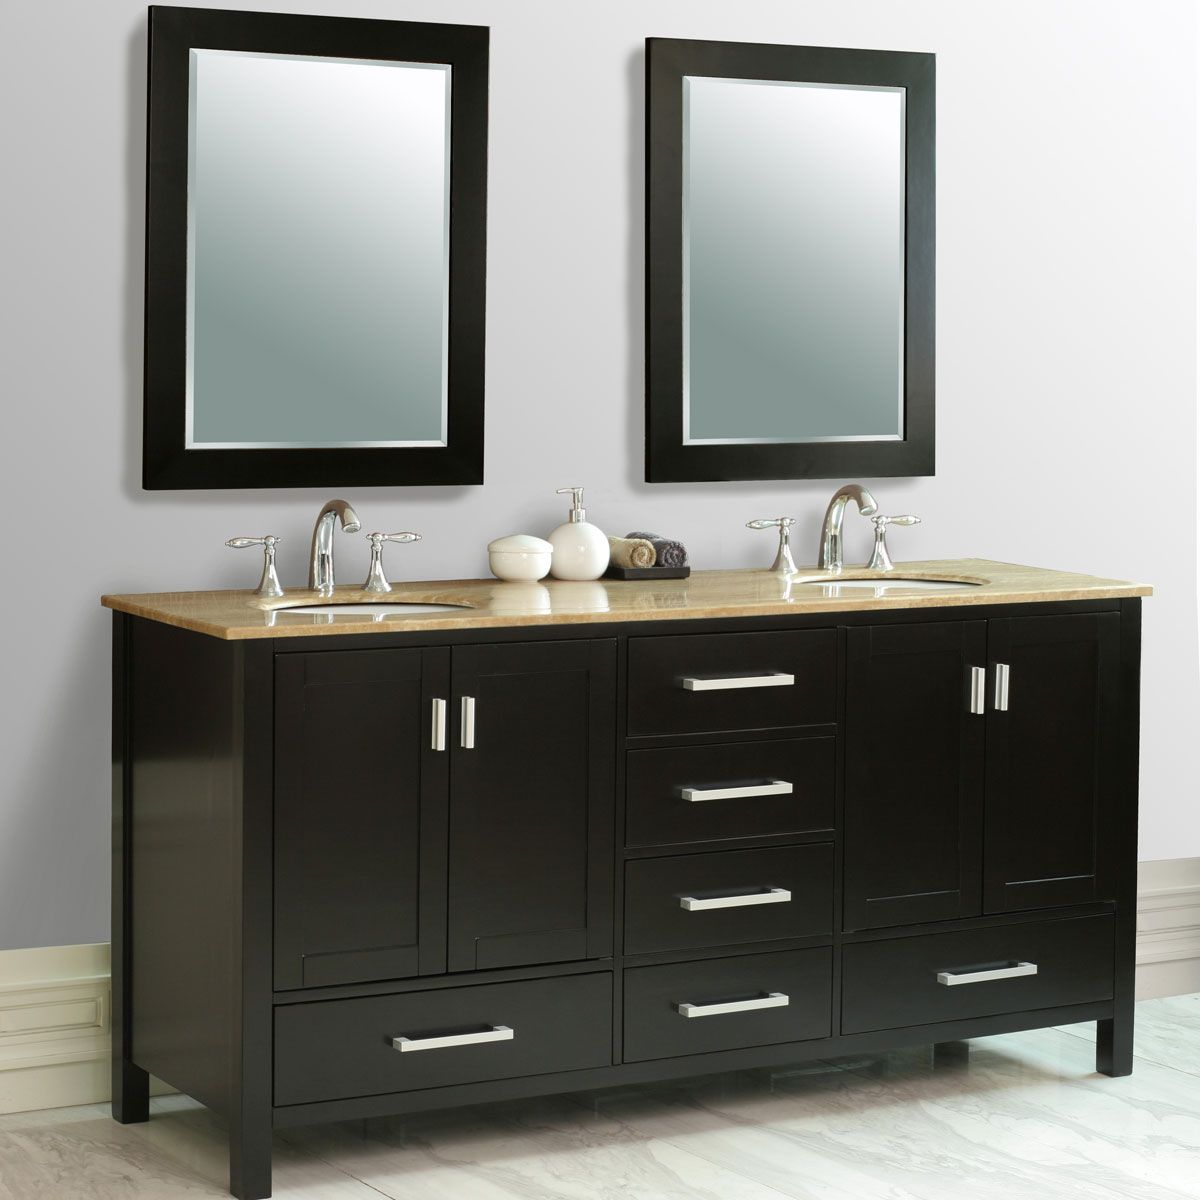 72 Oslo Double Sink Vanity Double Sink Vanity Double Sink Bathroom Vanity Vanity Sink